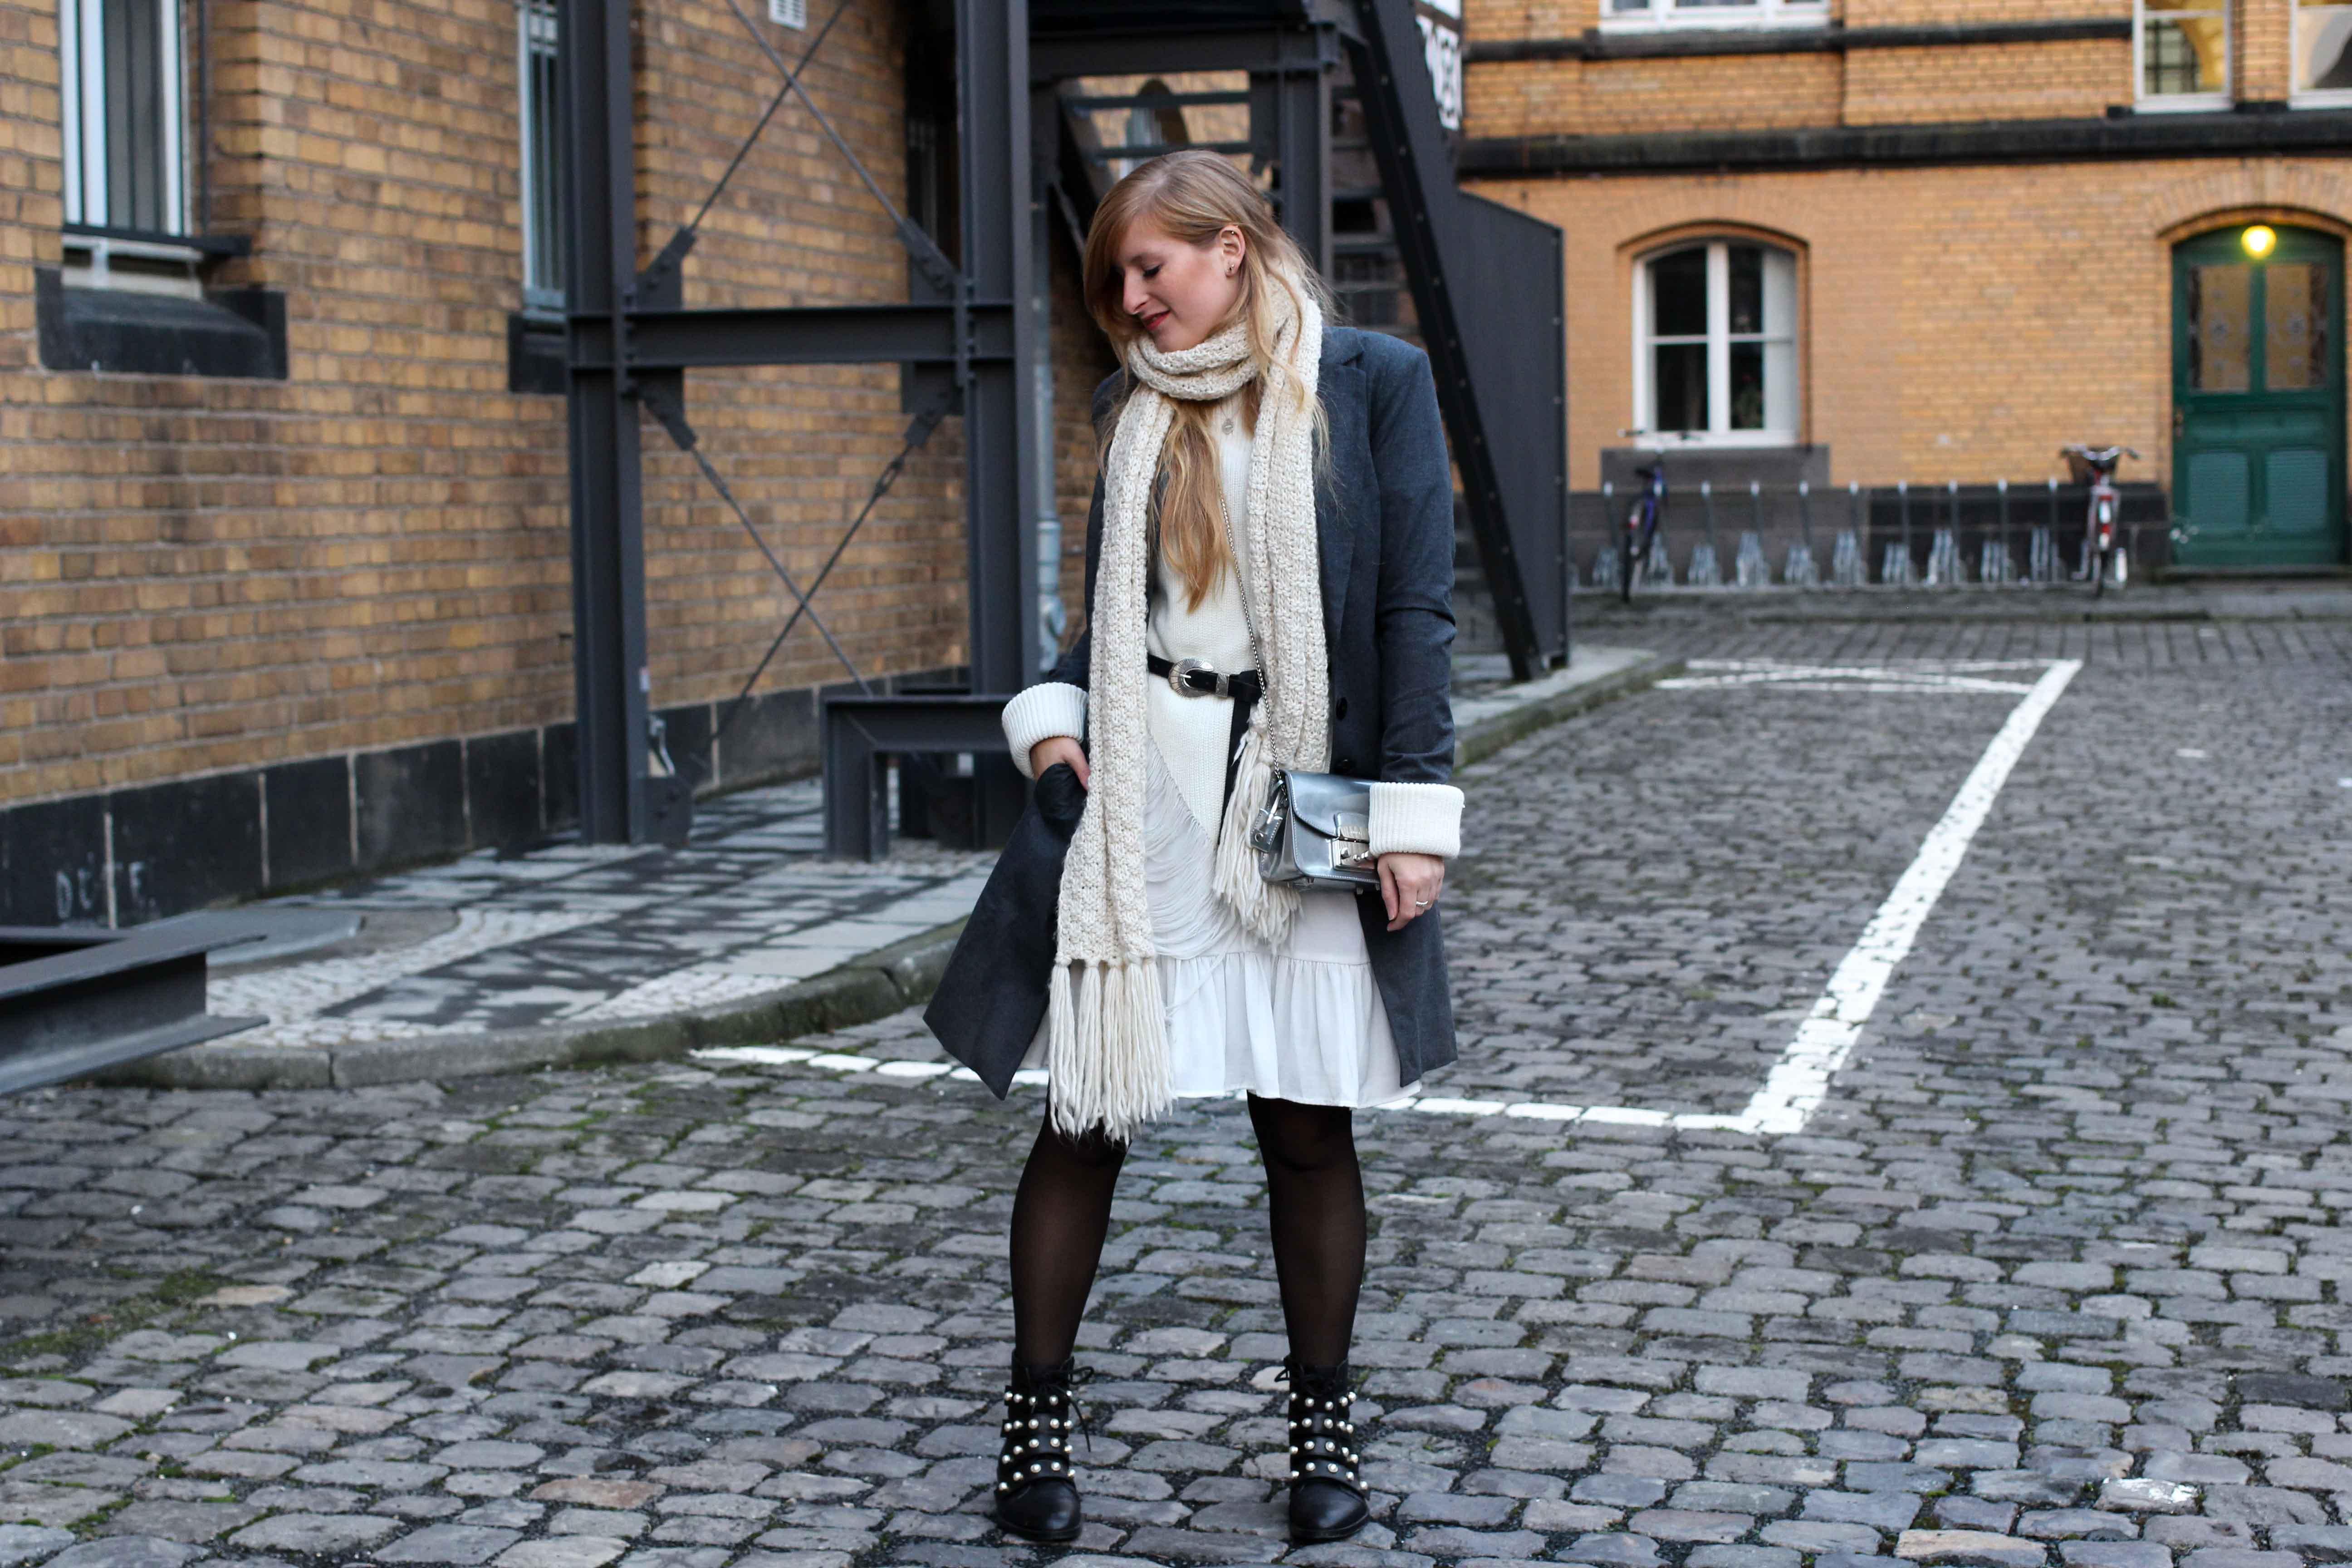 Winter-Layering weißes Kleid, Ripped Pullover Asos schwarze Strumpfhose Hunkemöller kombinieren Outfit Modeblog bonn 94